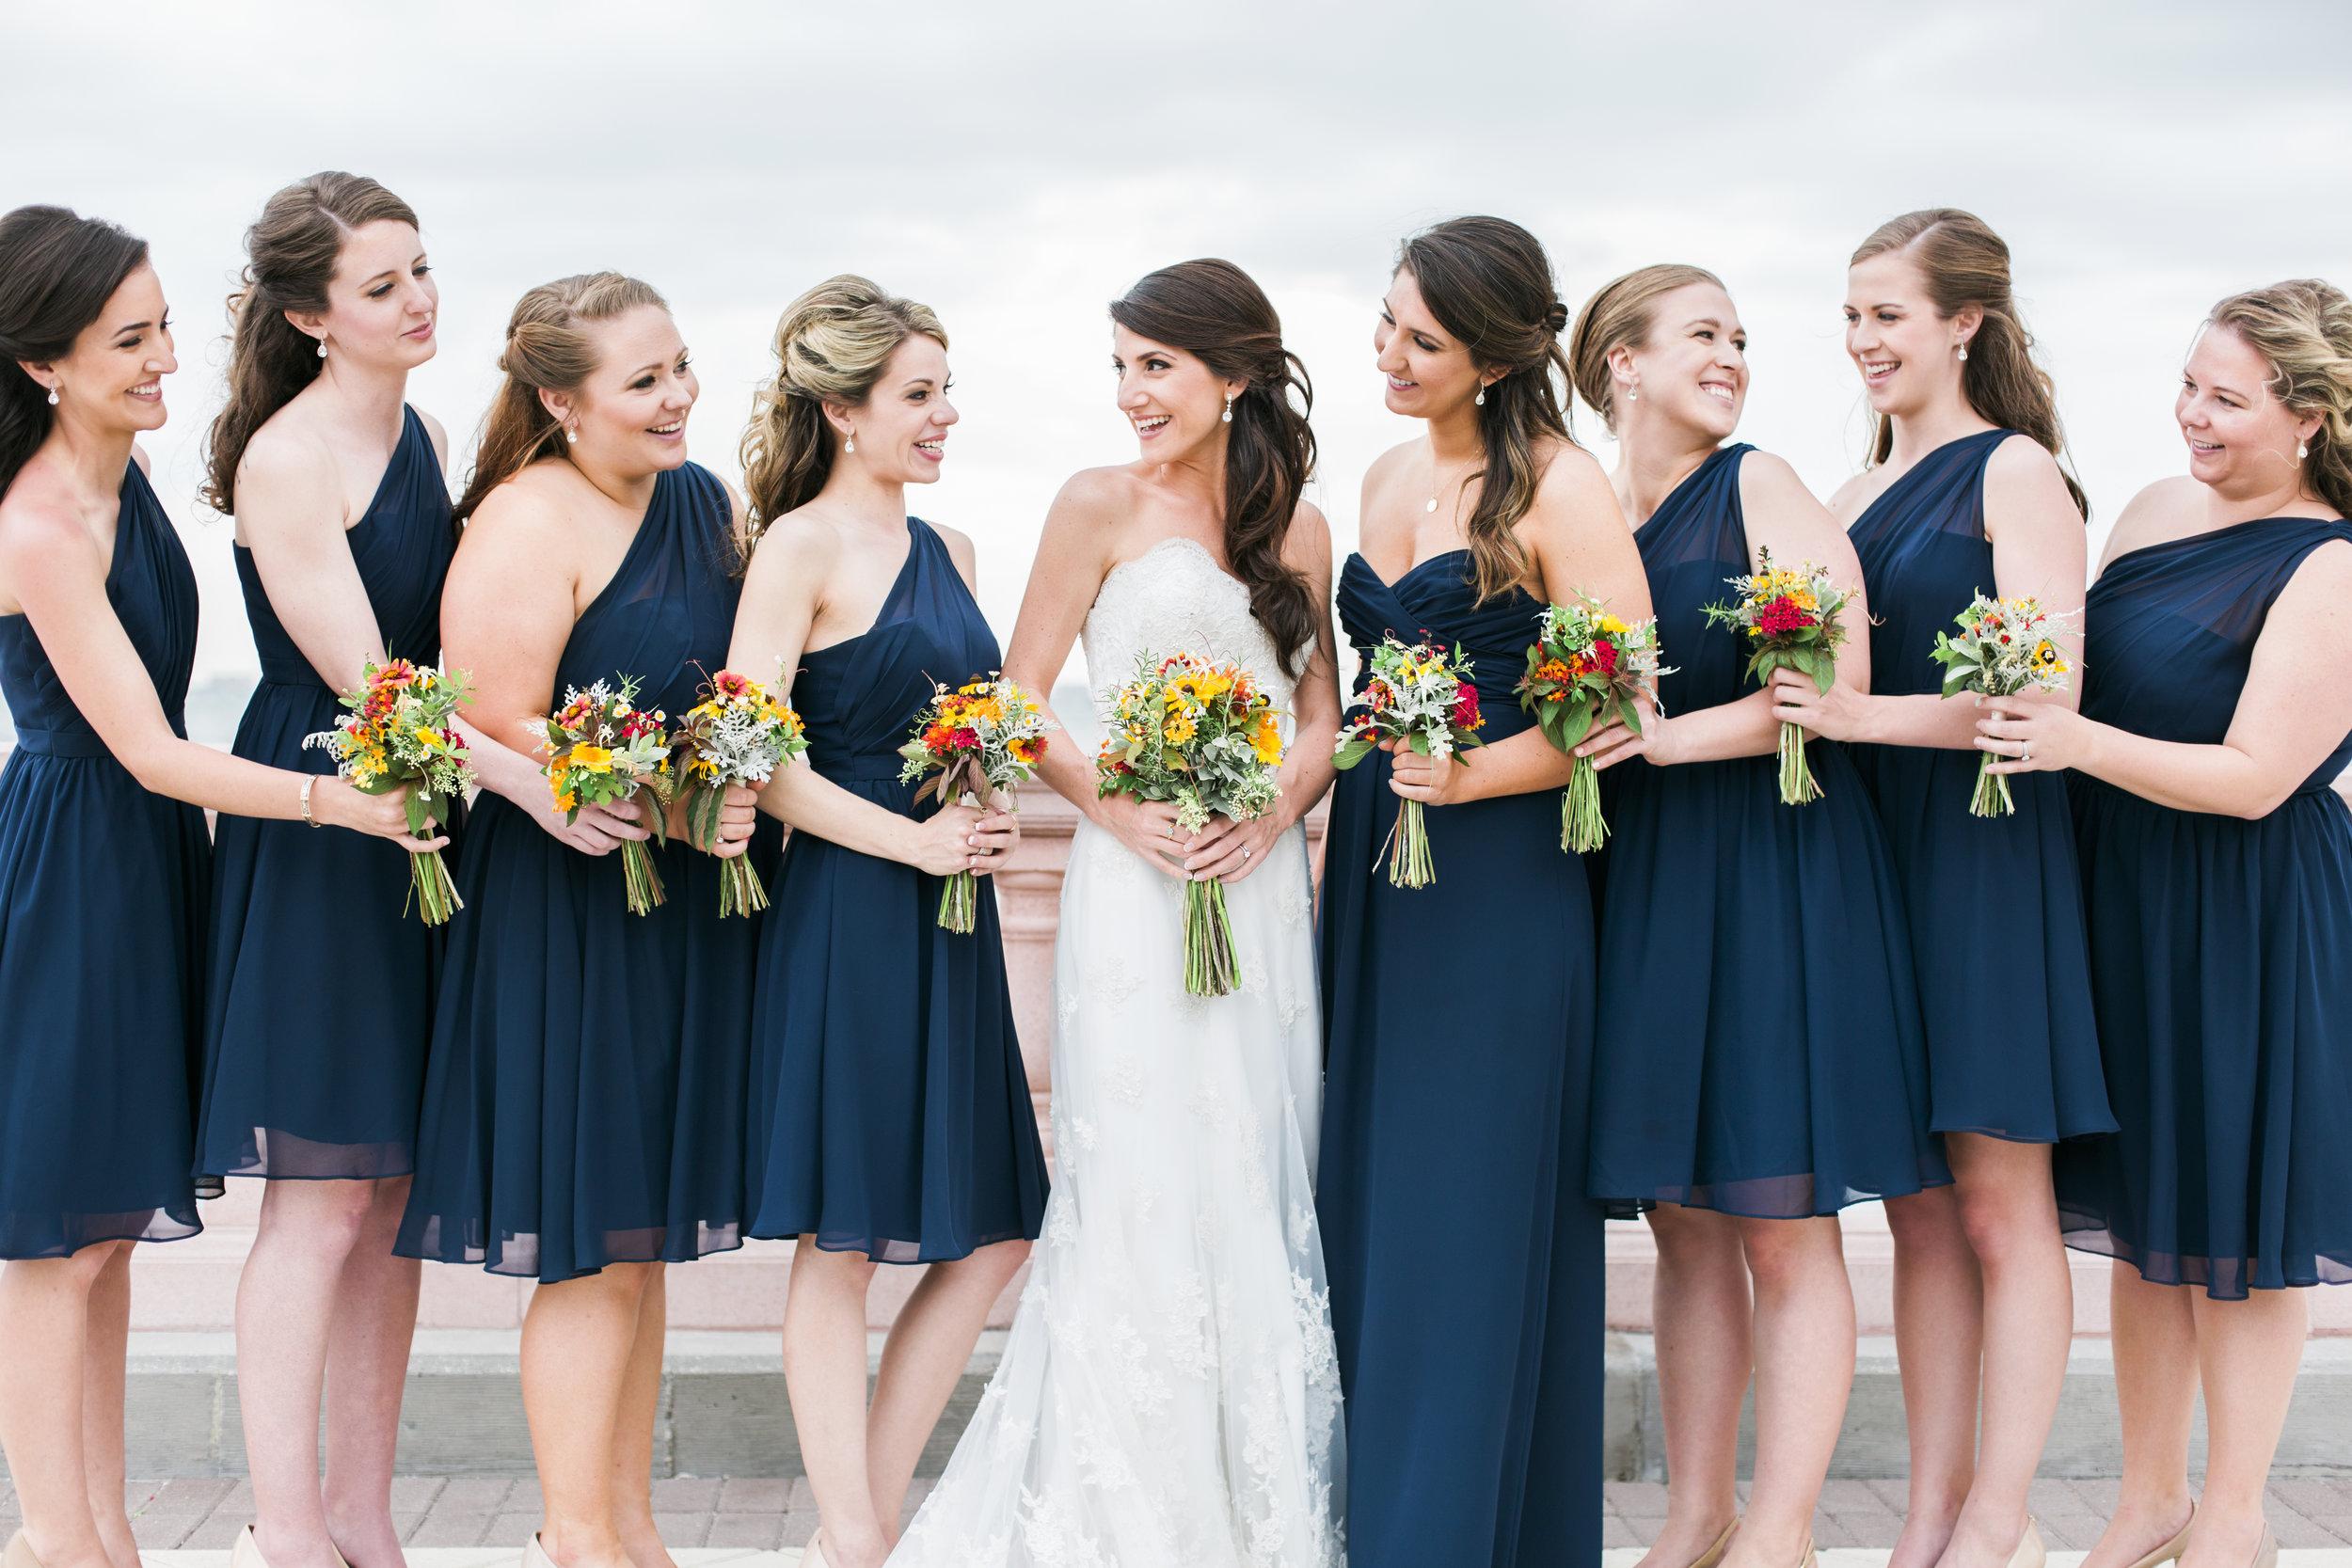 Rachel + Cole - Ringling Wedding Photography - Sarasota Wedding Photography - Emily & Co. Photography - 3. Wedding Party (24).jpg